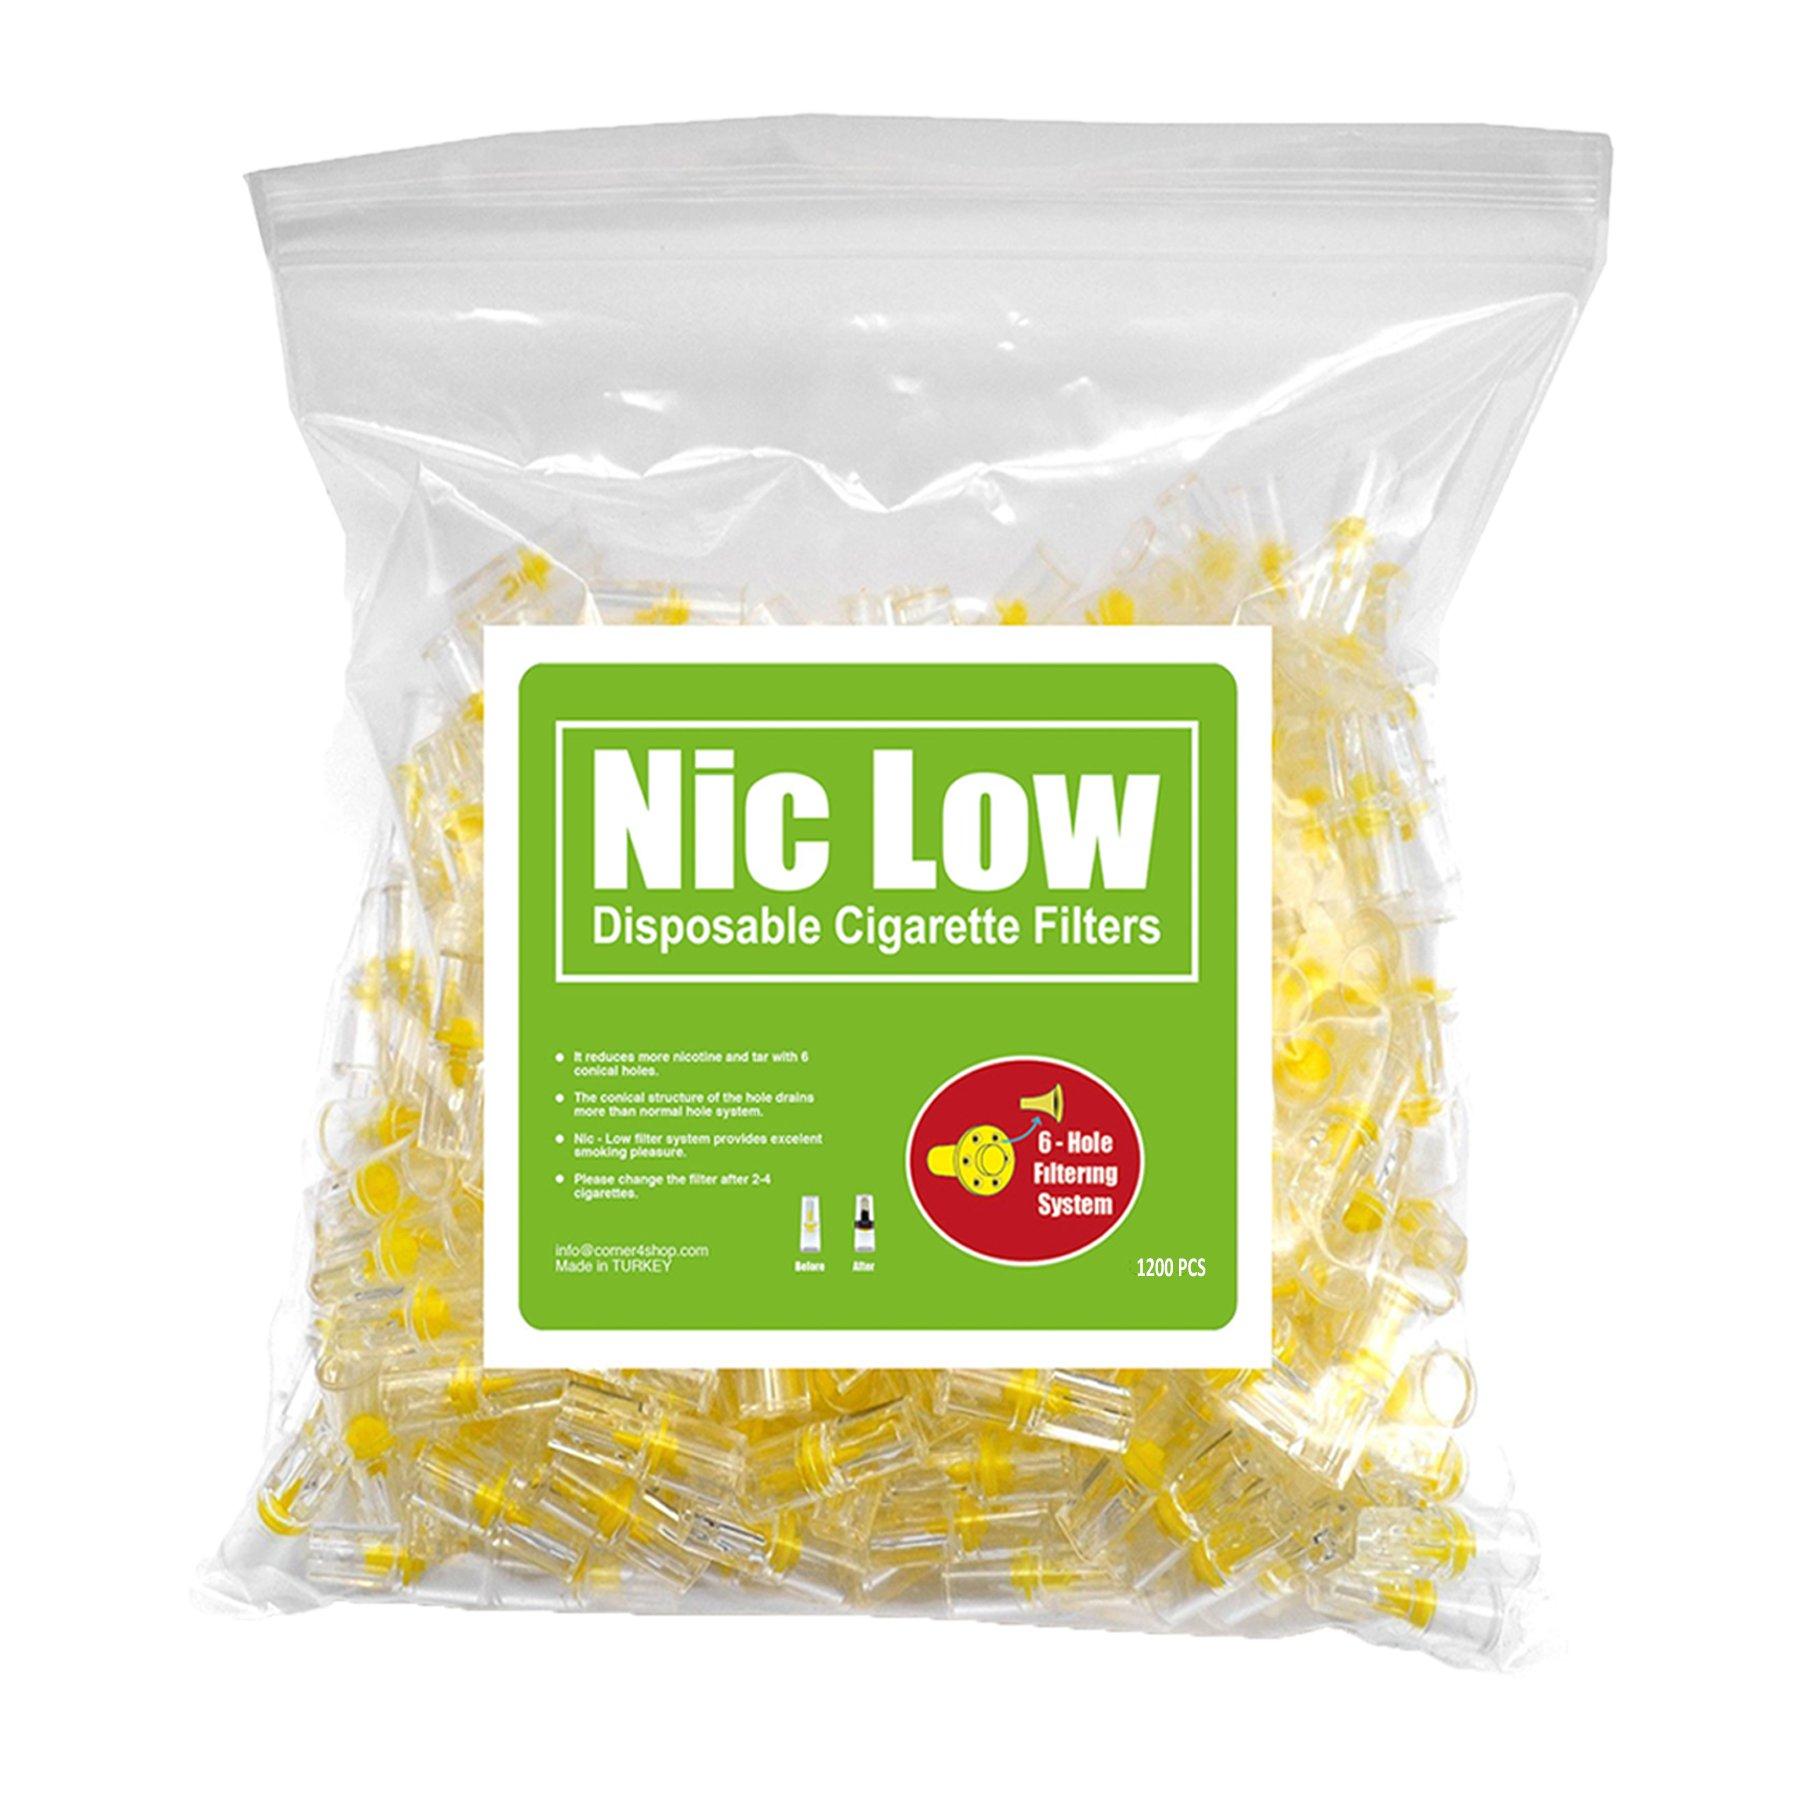 Nic Low Disposable Cigarette Filters - Bulk Economy Pack (1200)